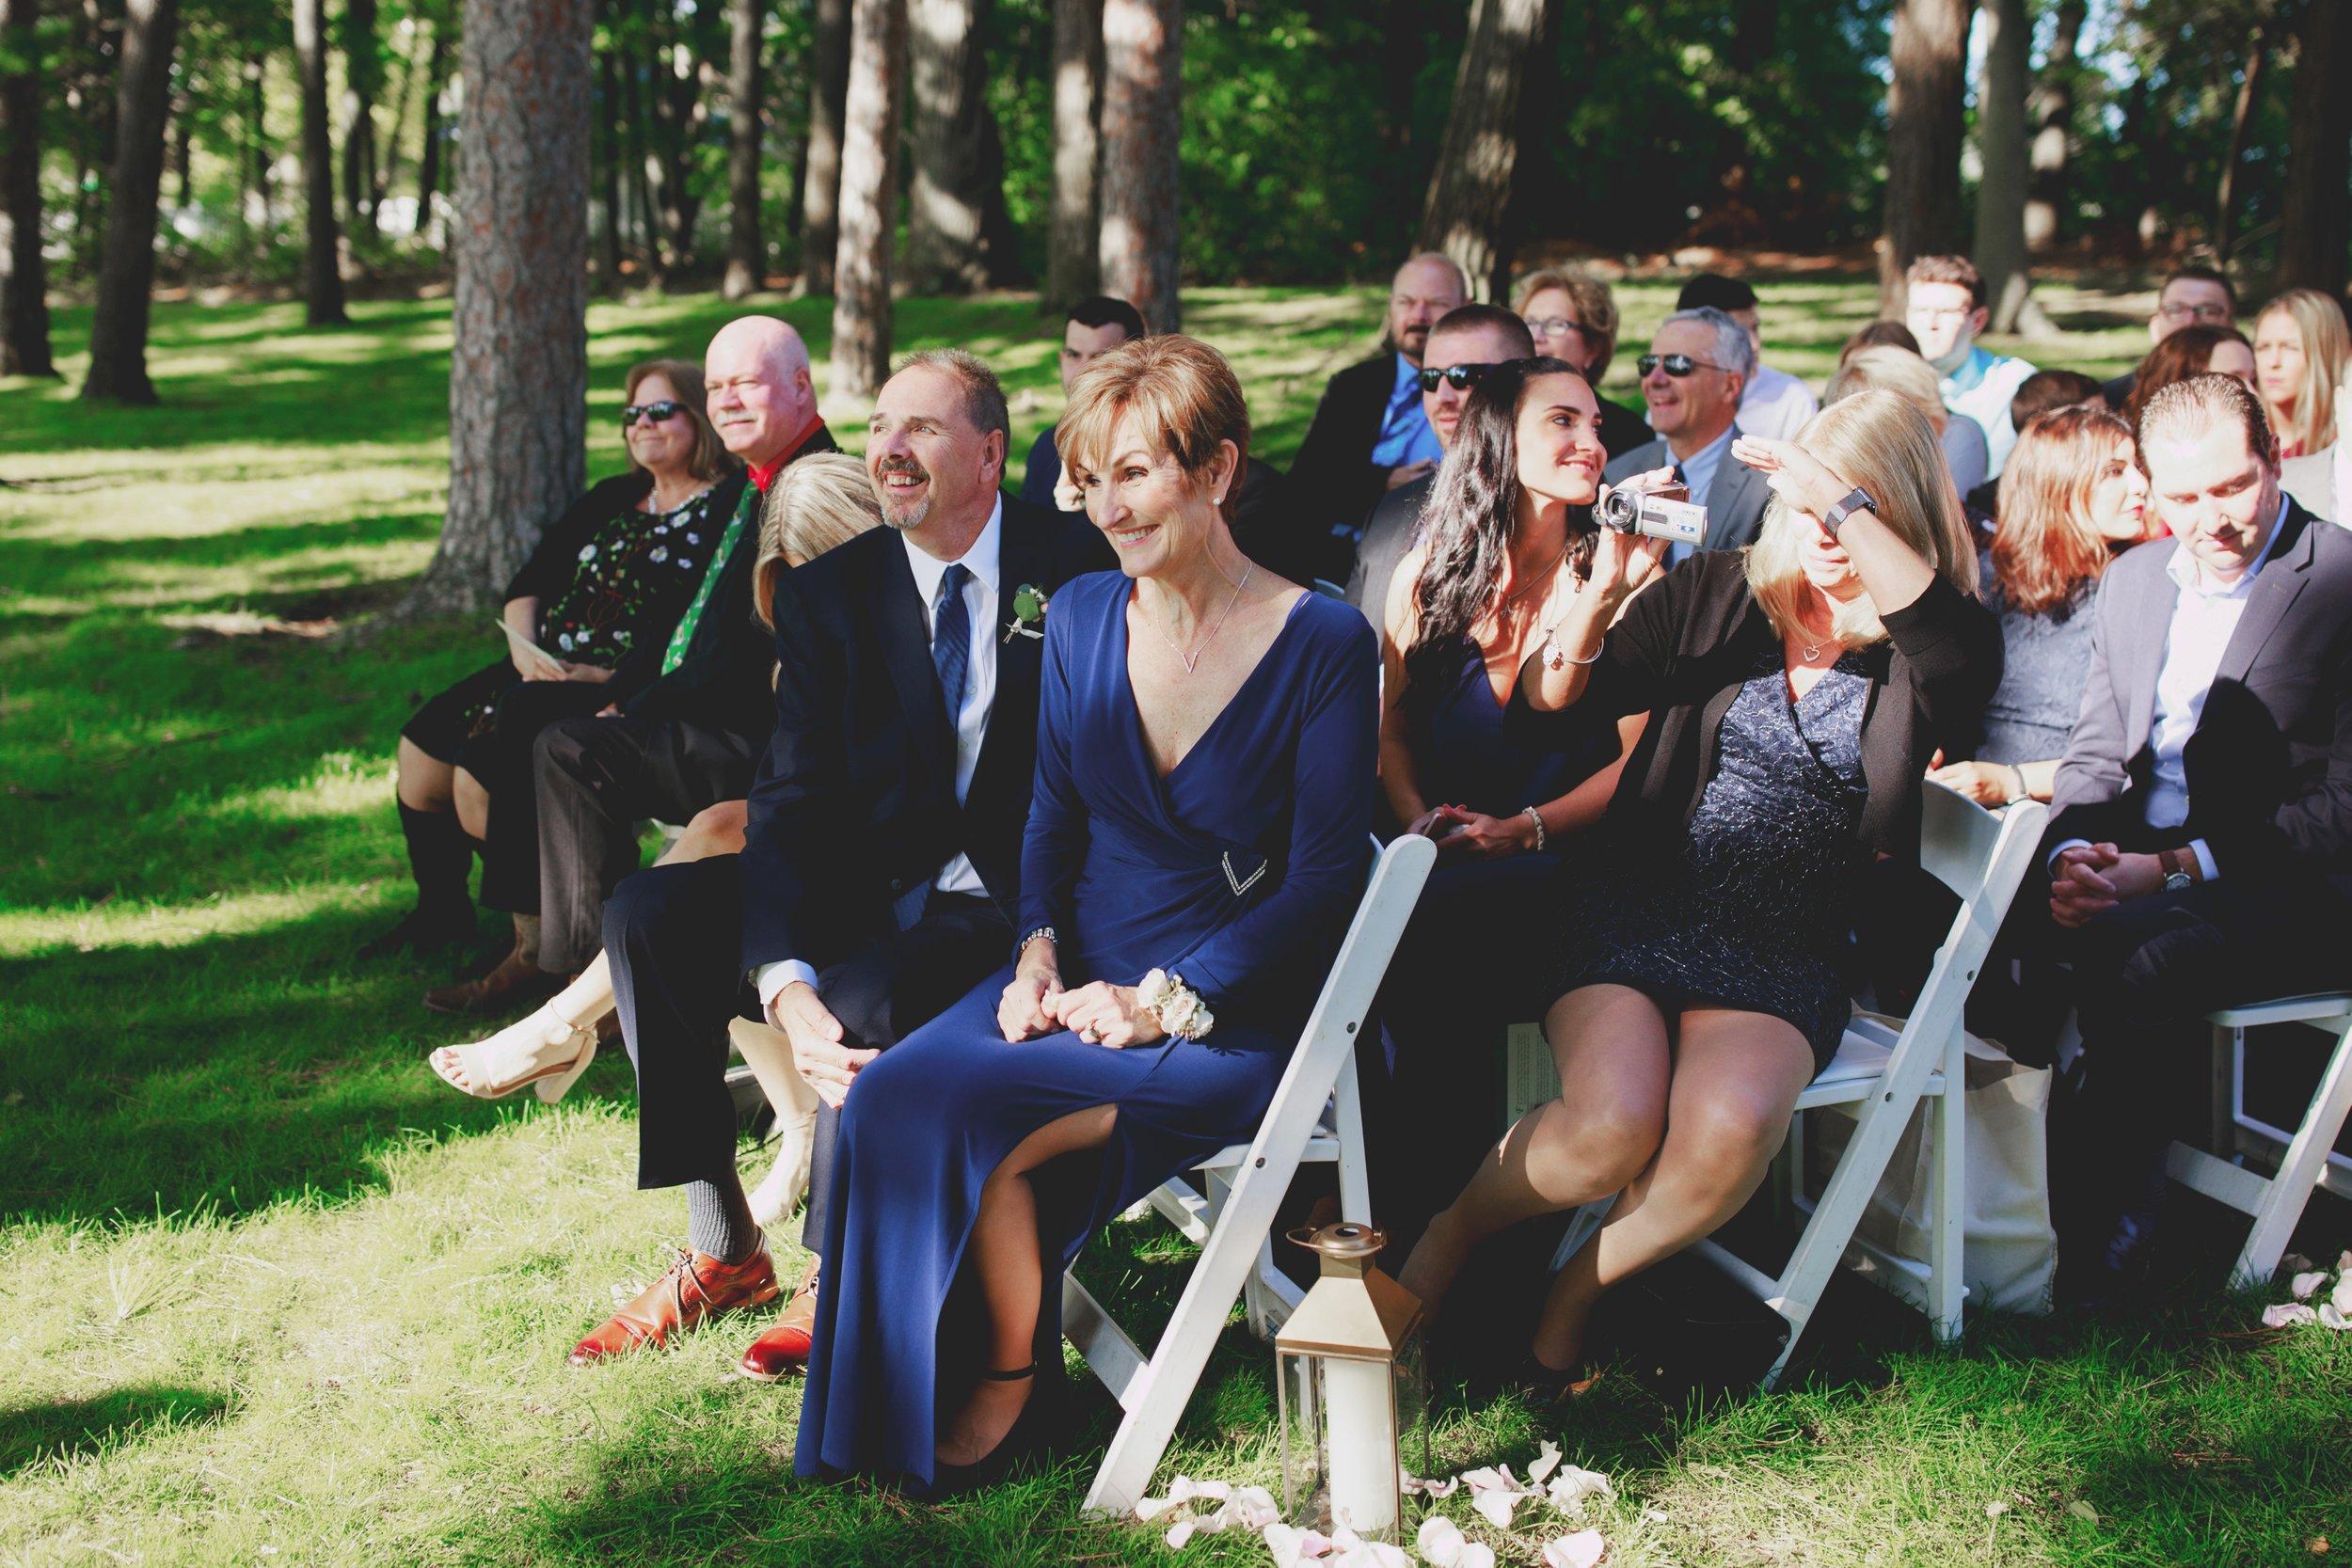 traverse_city_wedding_046.jpg